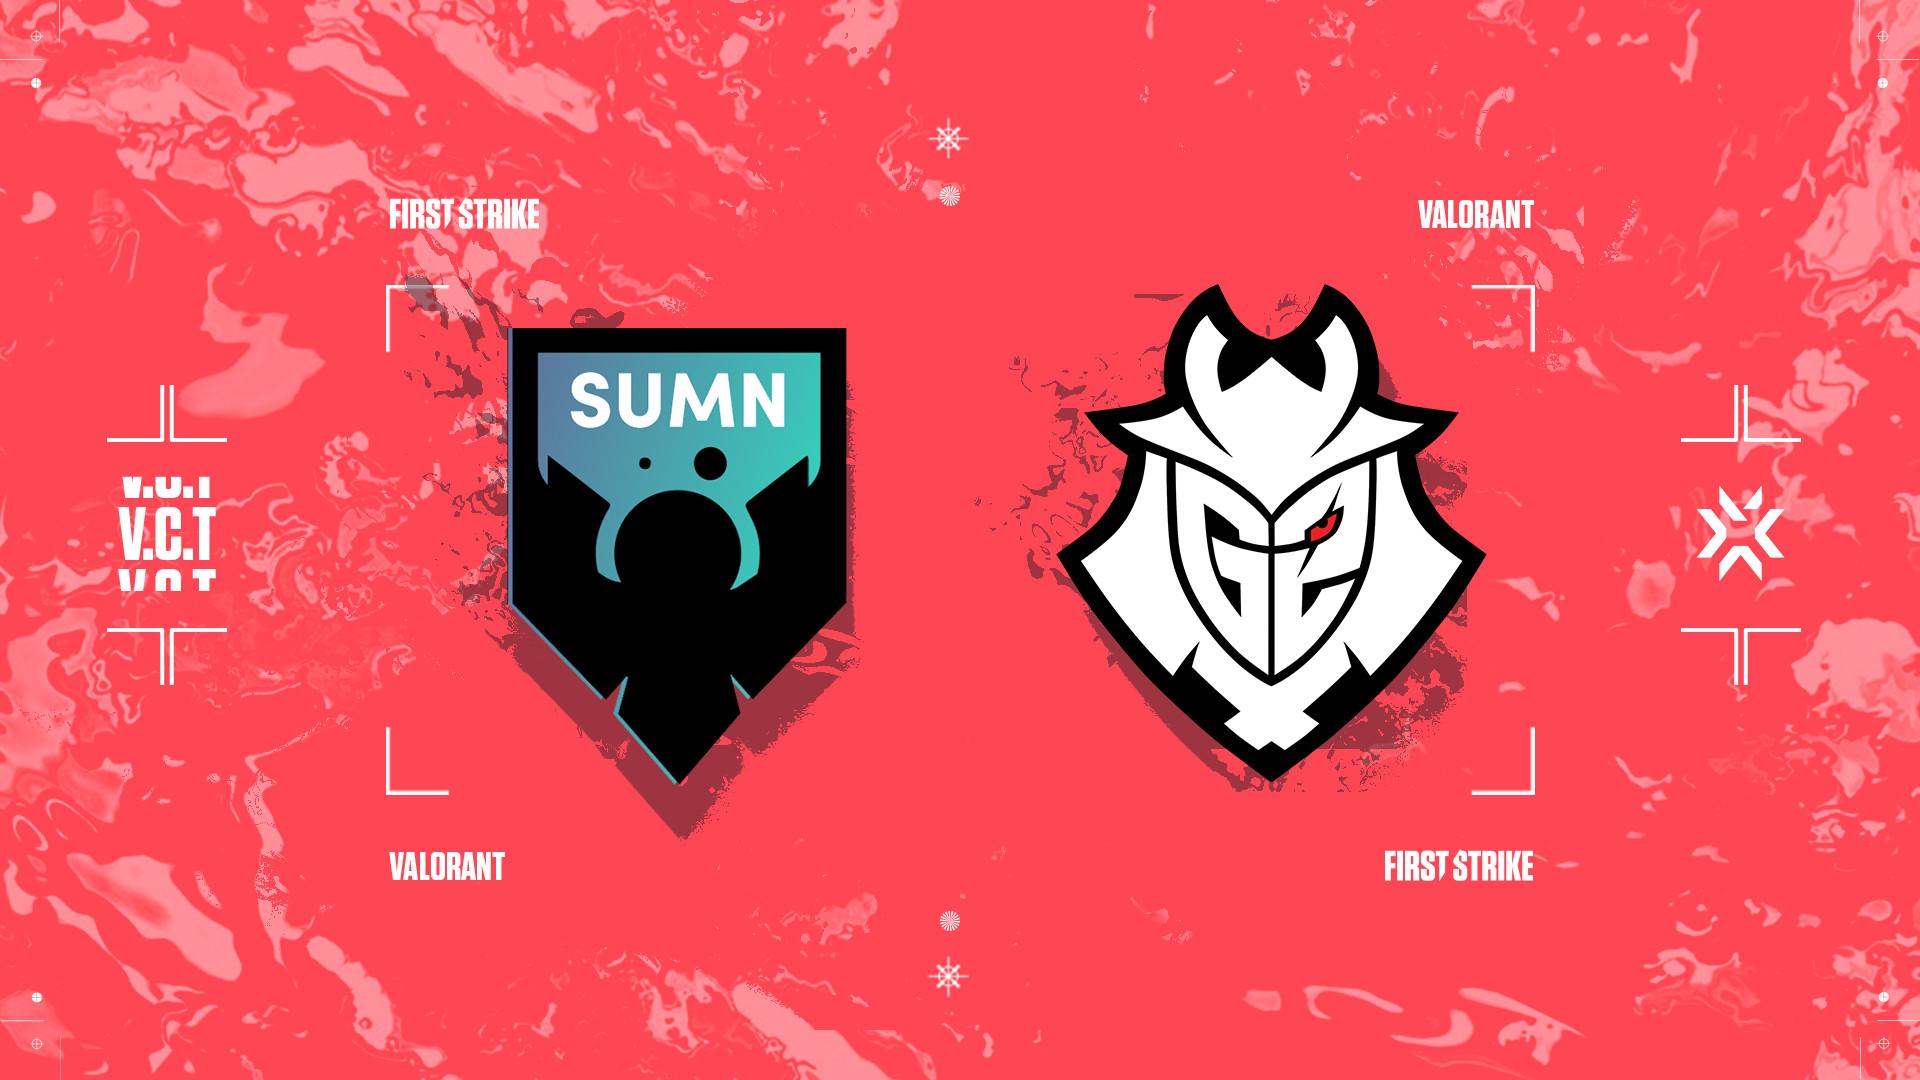 Evento principal de First Strike: Europa de VALORANT – Entrevista con G2 y SUMN FC